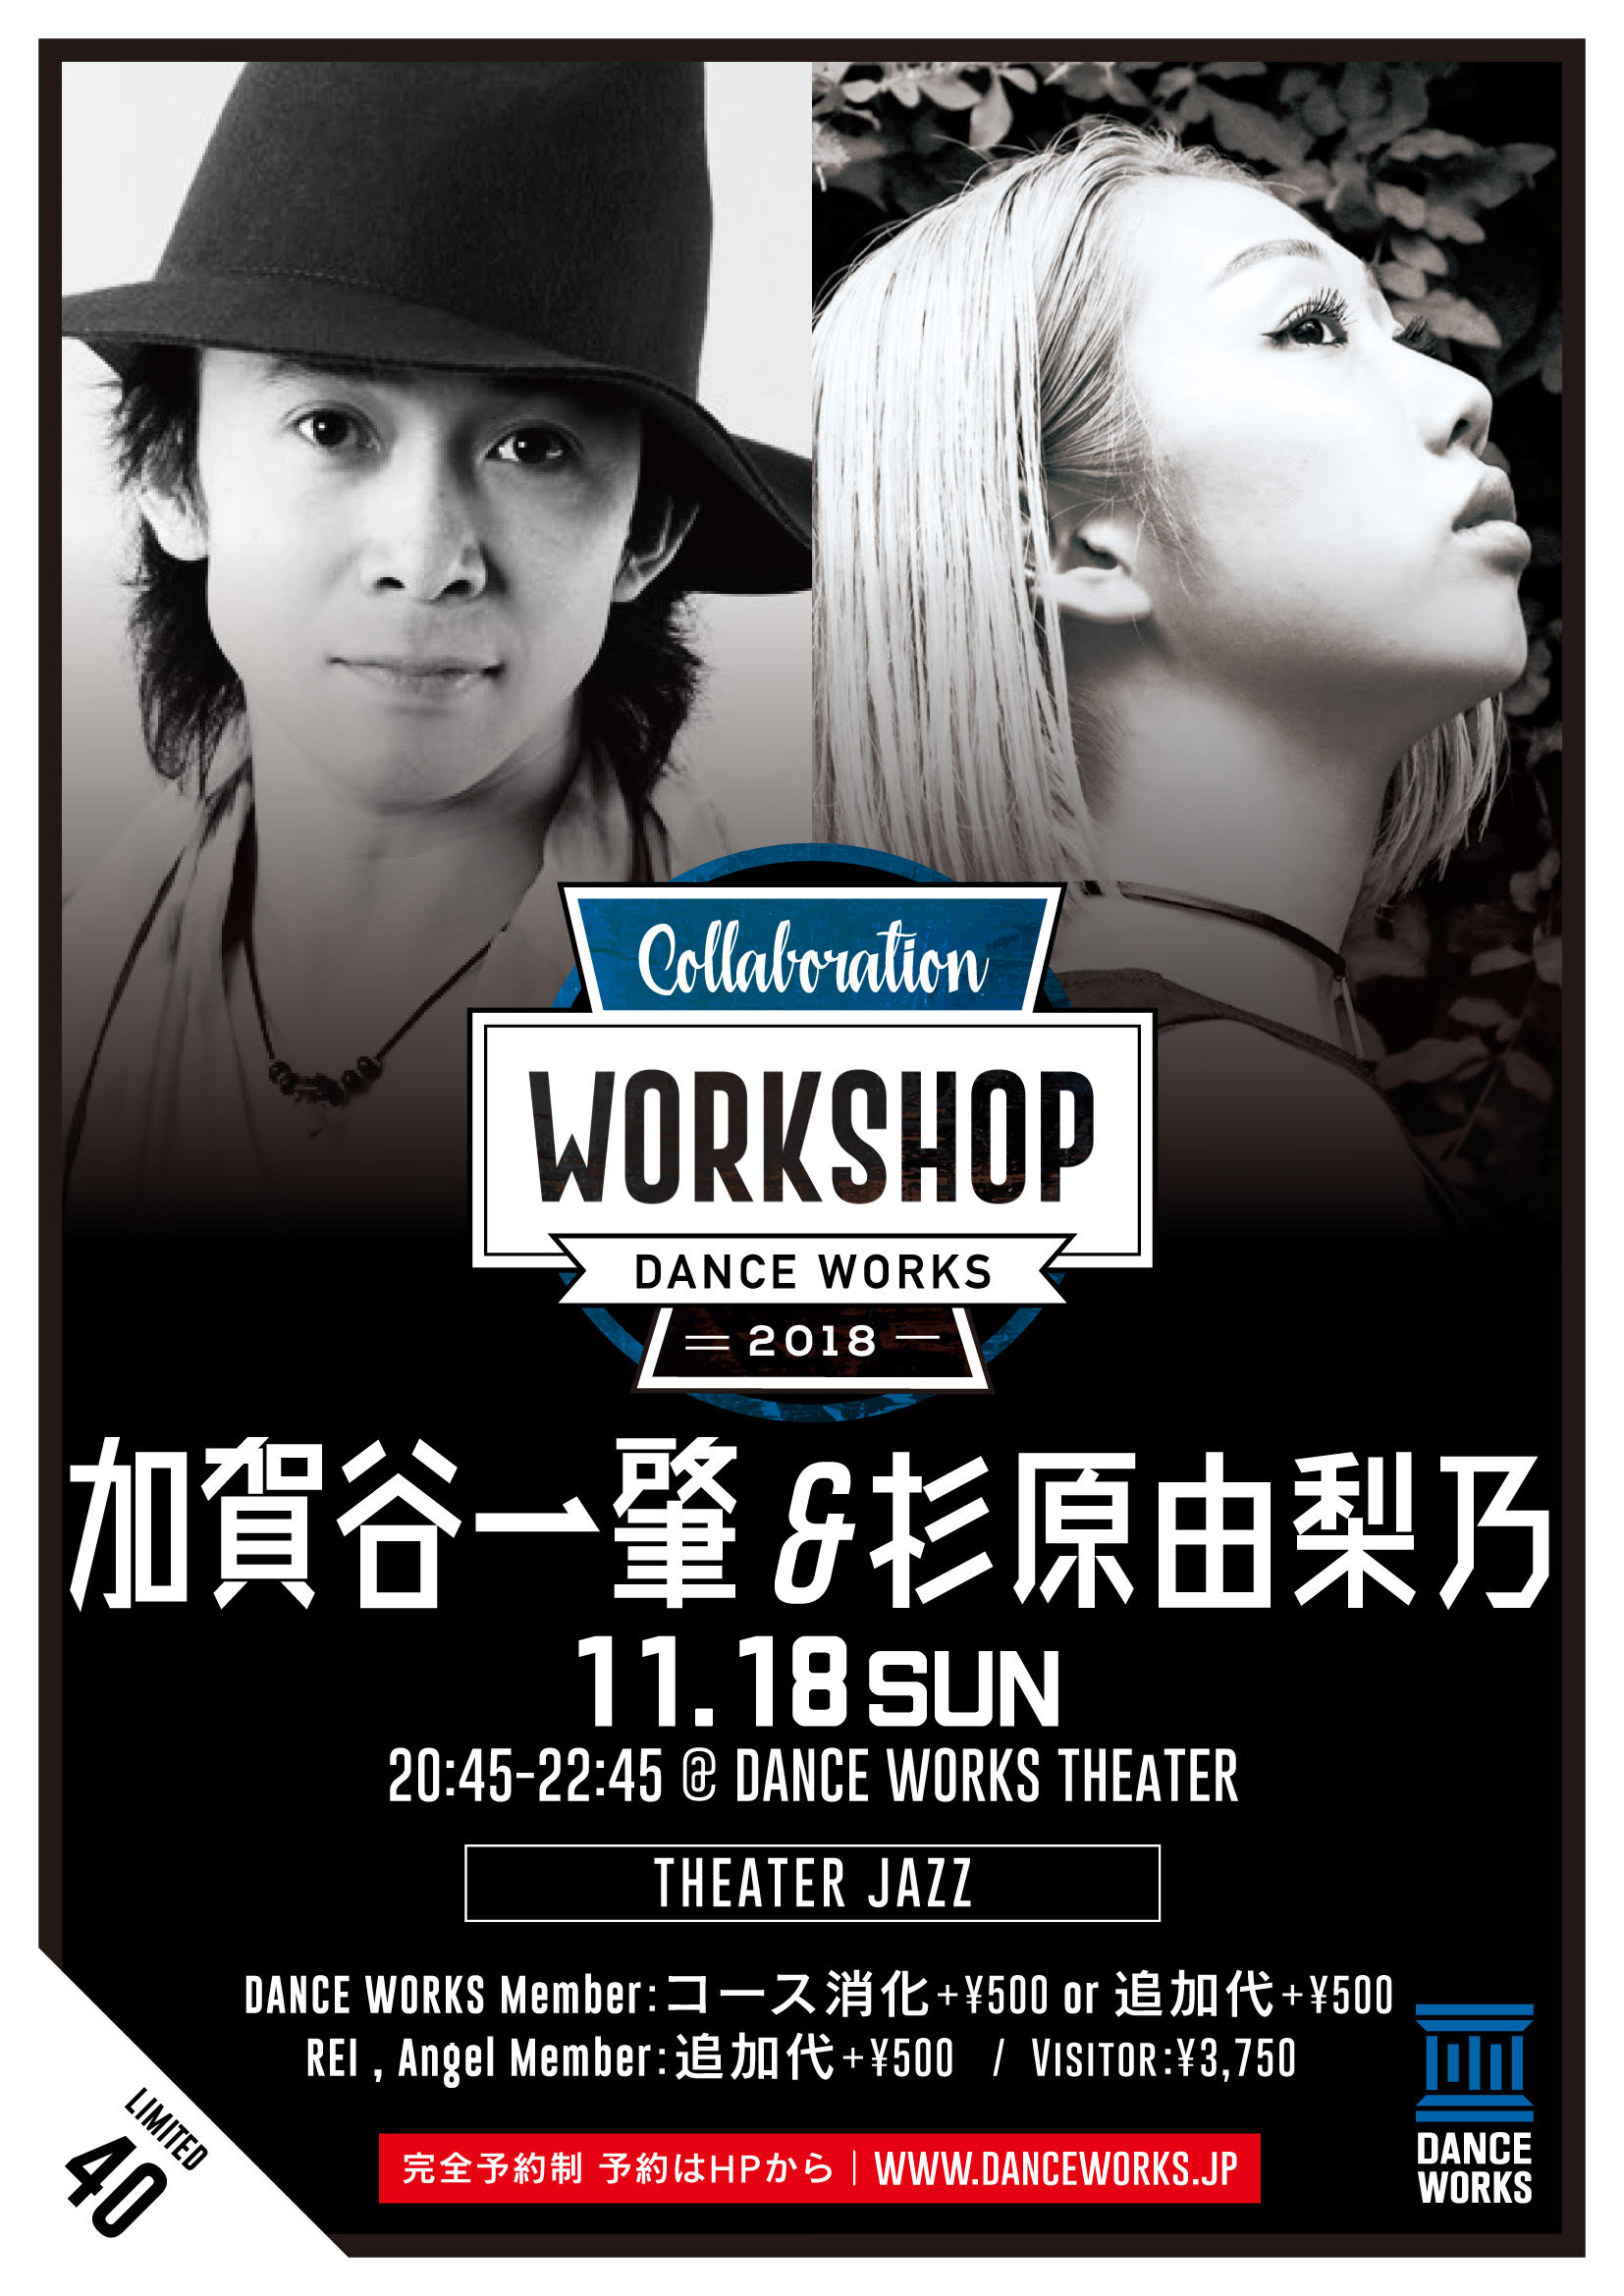 11/18(sun) 加賀谷一肇×杉原由梨乃 THEATER JAZZ WORKSHOP開催決定!!